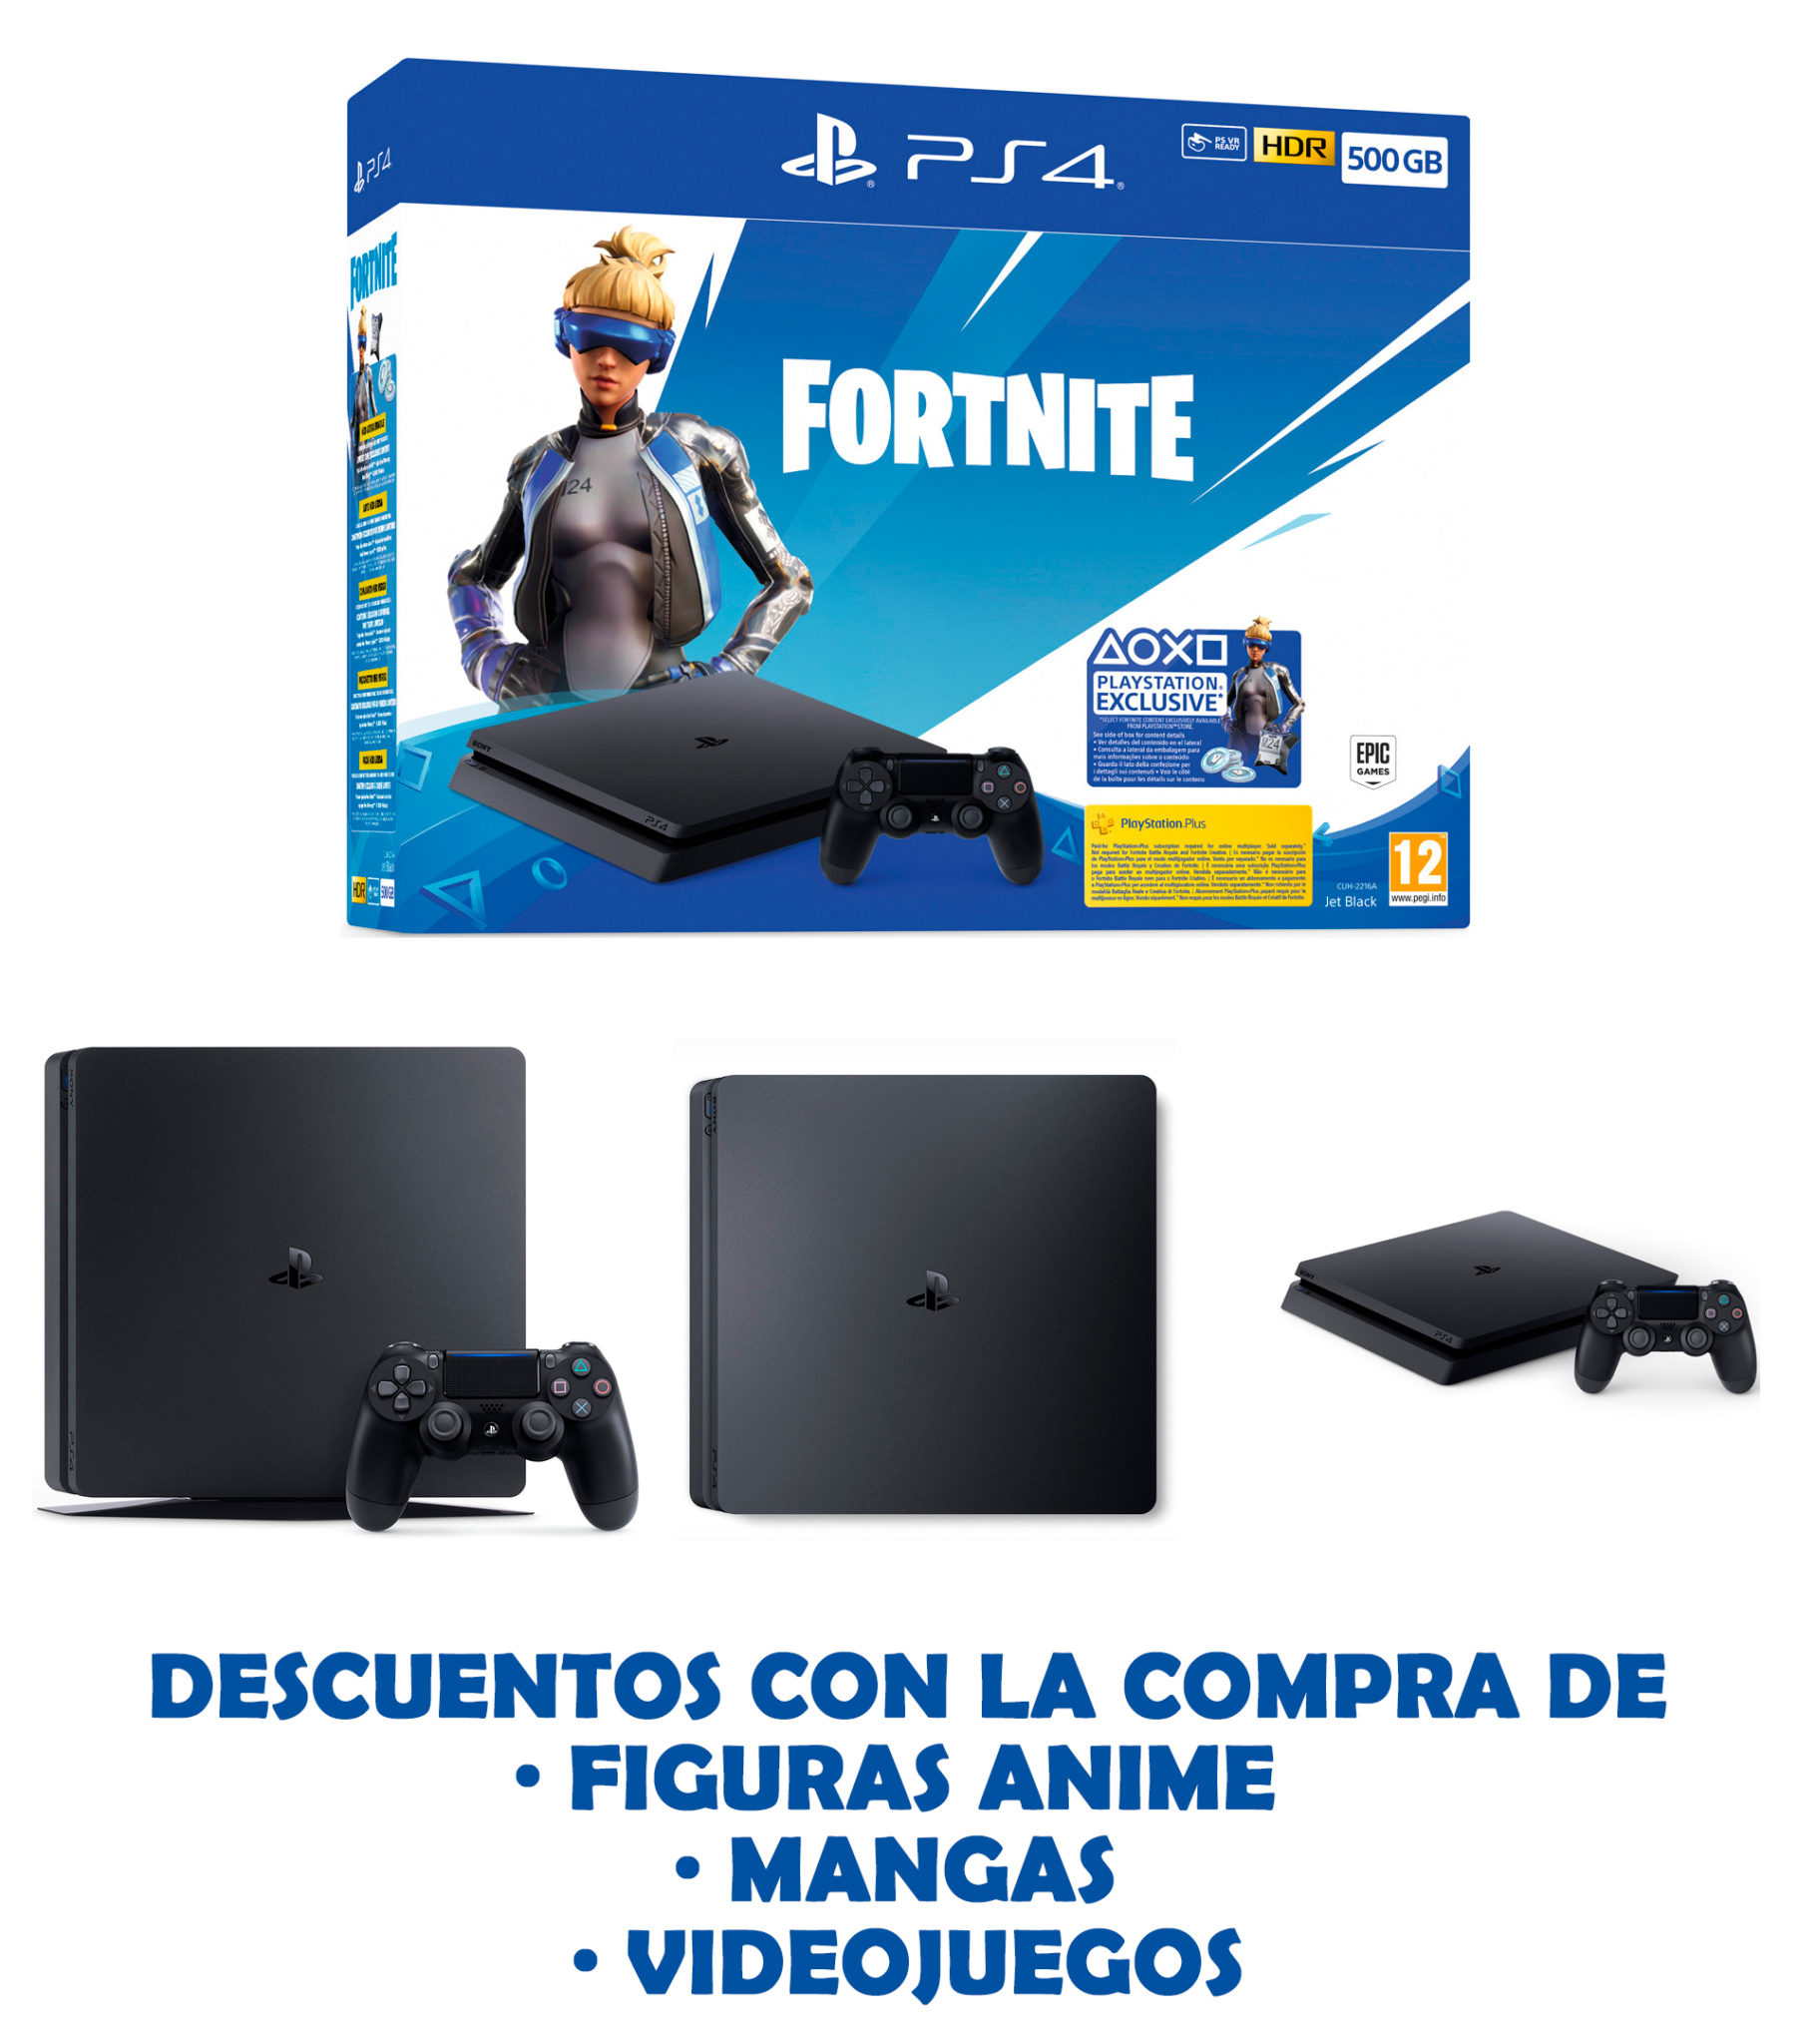 Consola-PS4-Slim-500GB-Fortnite-01